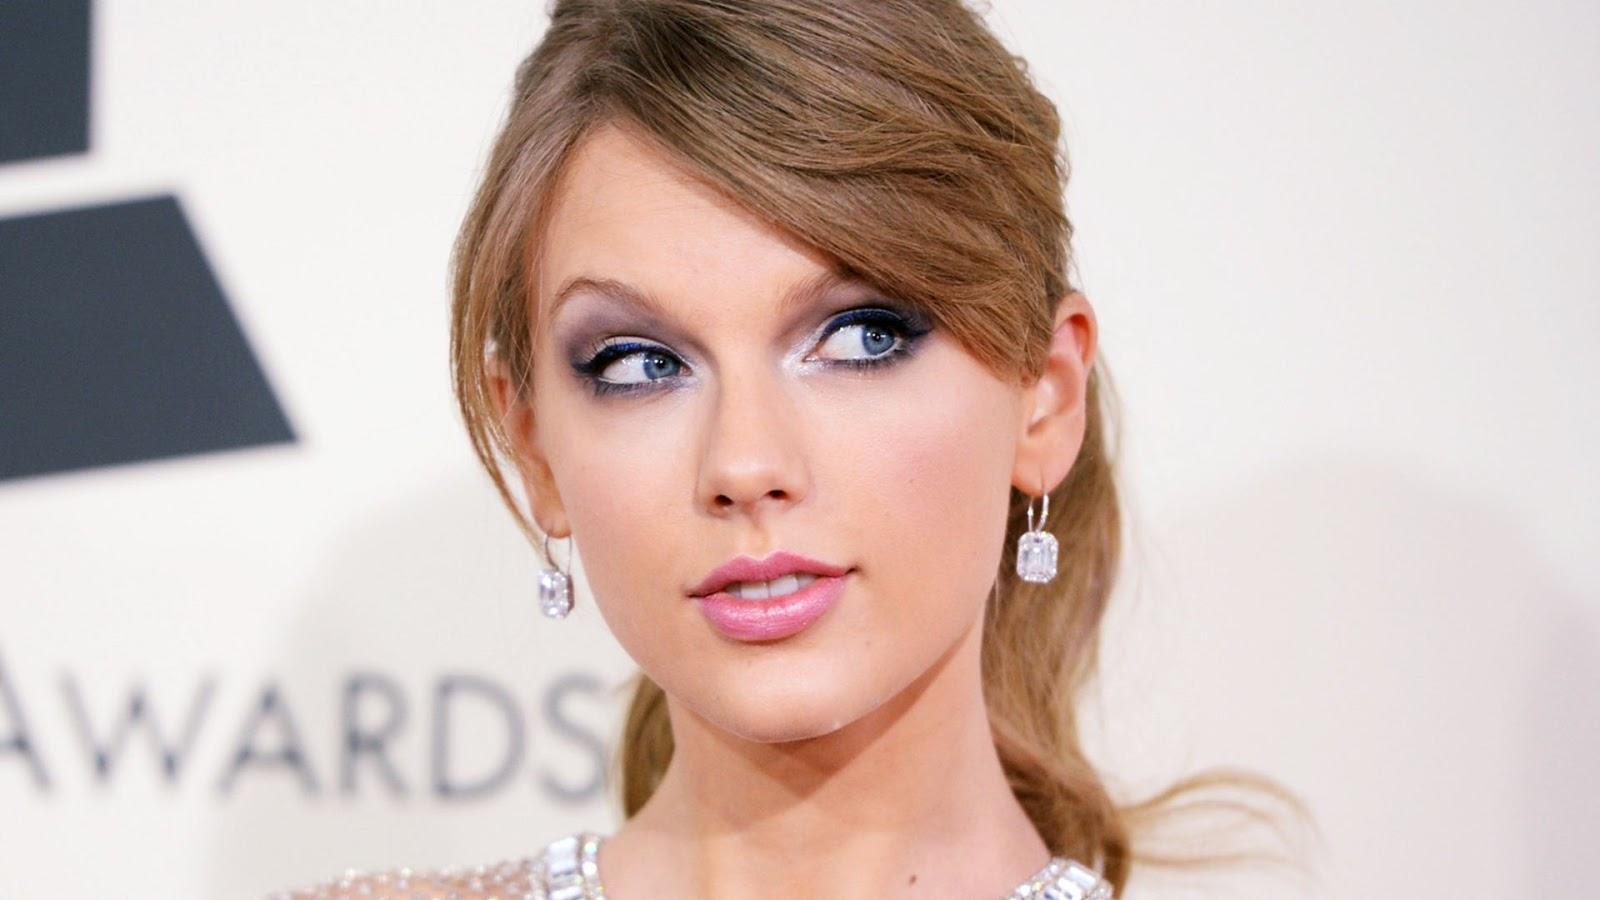 Grammy Awards Taylor Swift HD Wallpaper